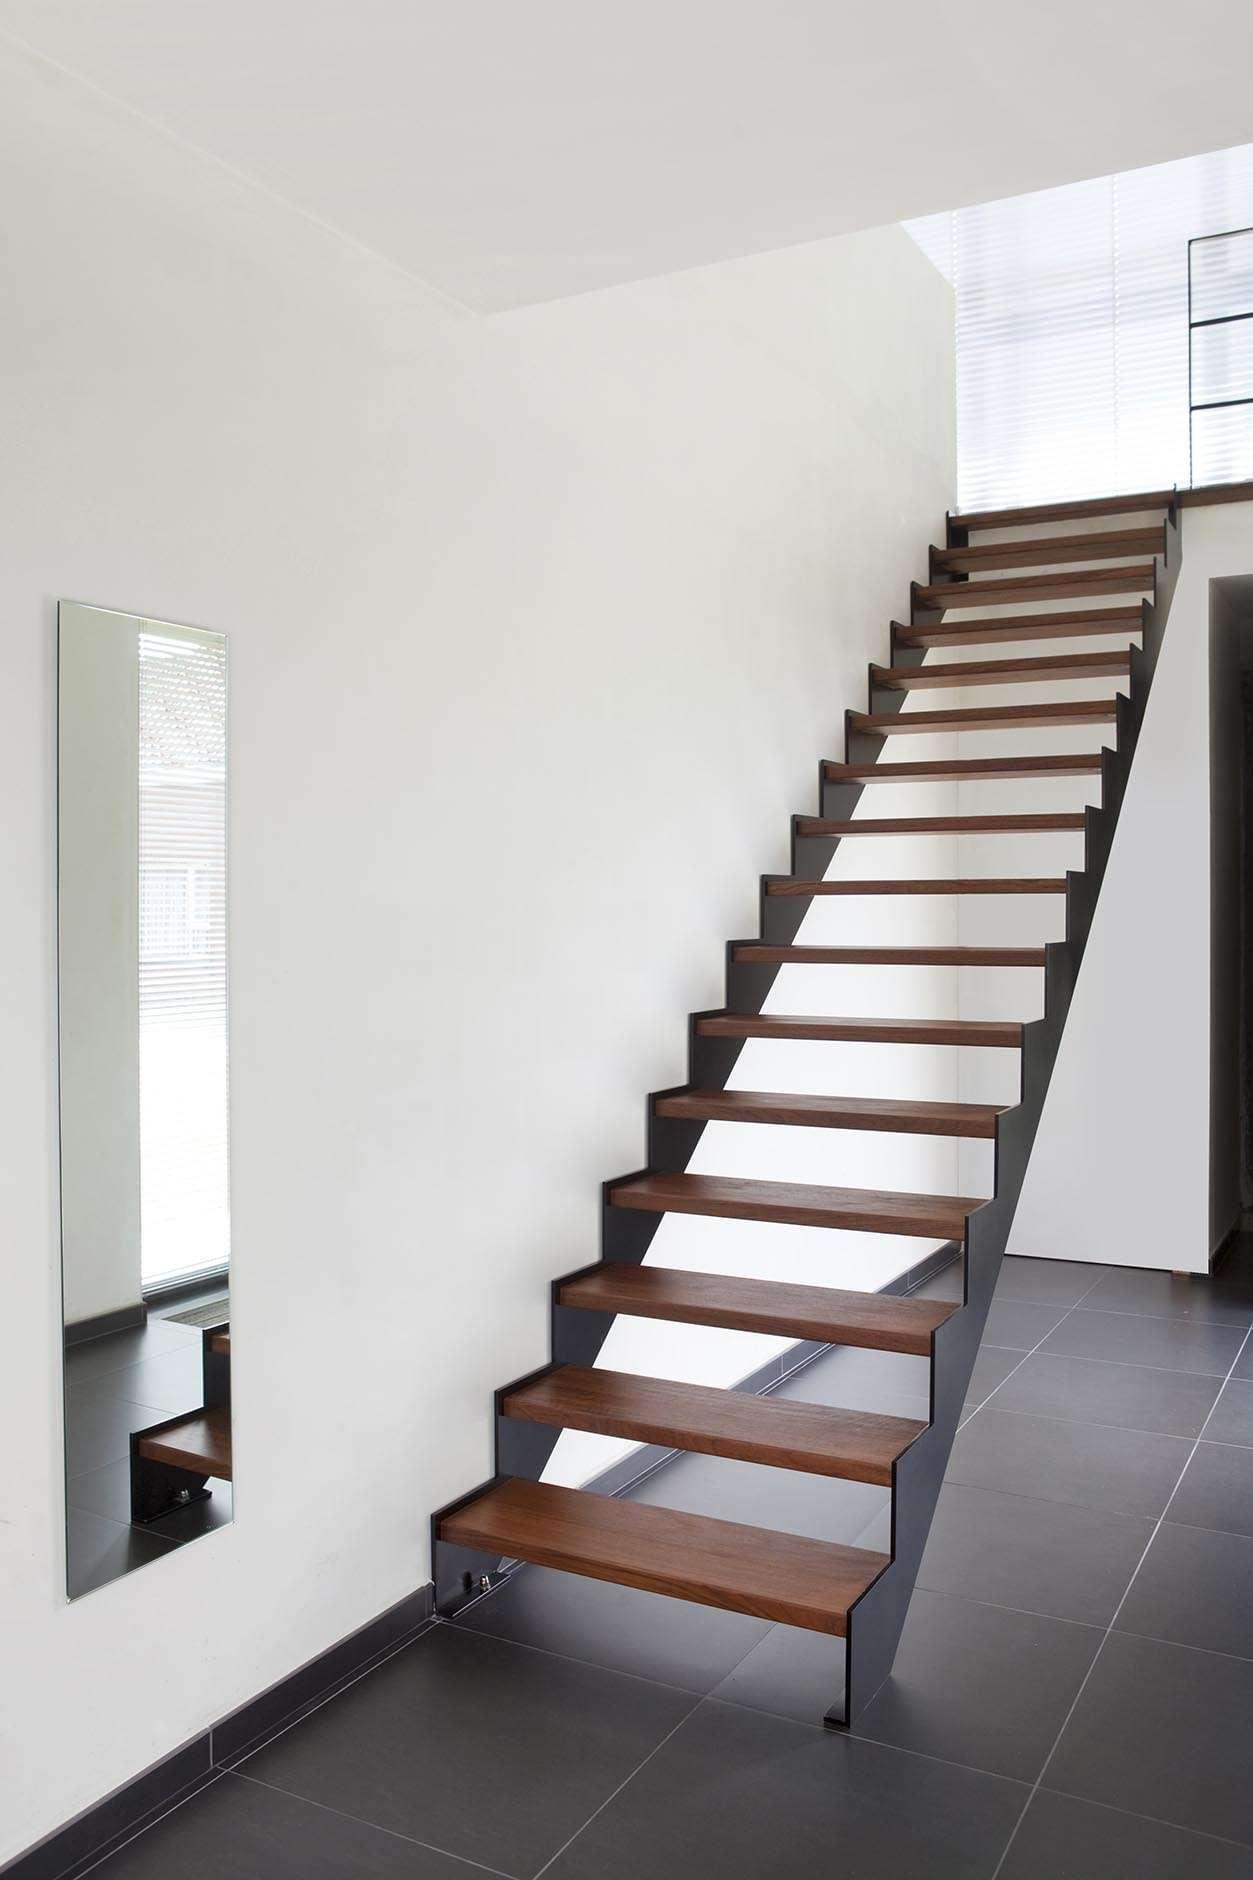 trap-zwart-metaal-houten-treden-strak